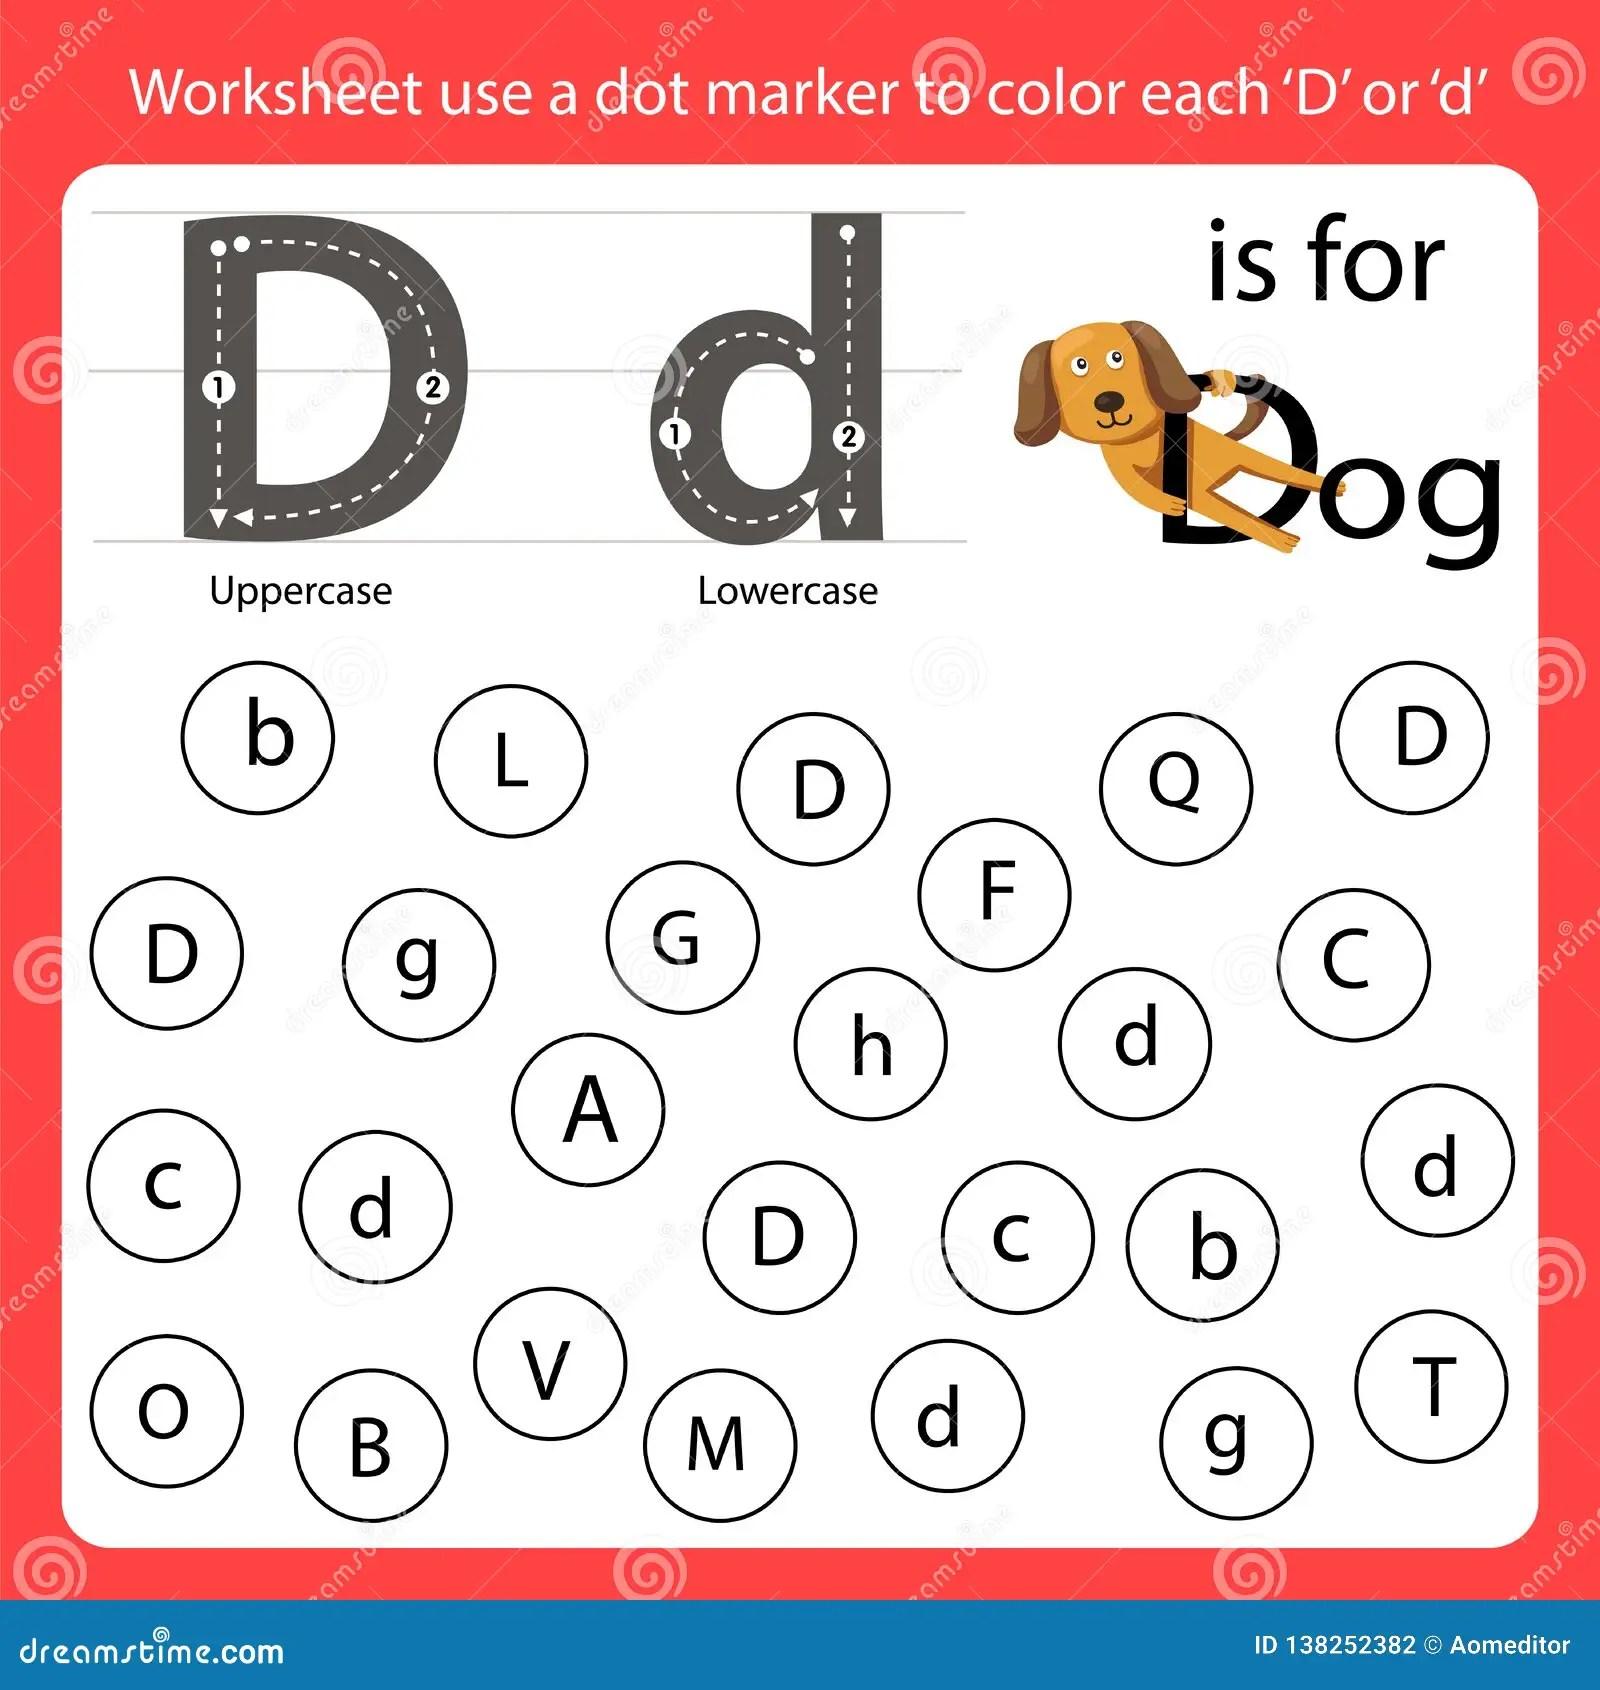 Find The Letter Worksheet Use A Dot Marker To Color Each D